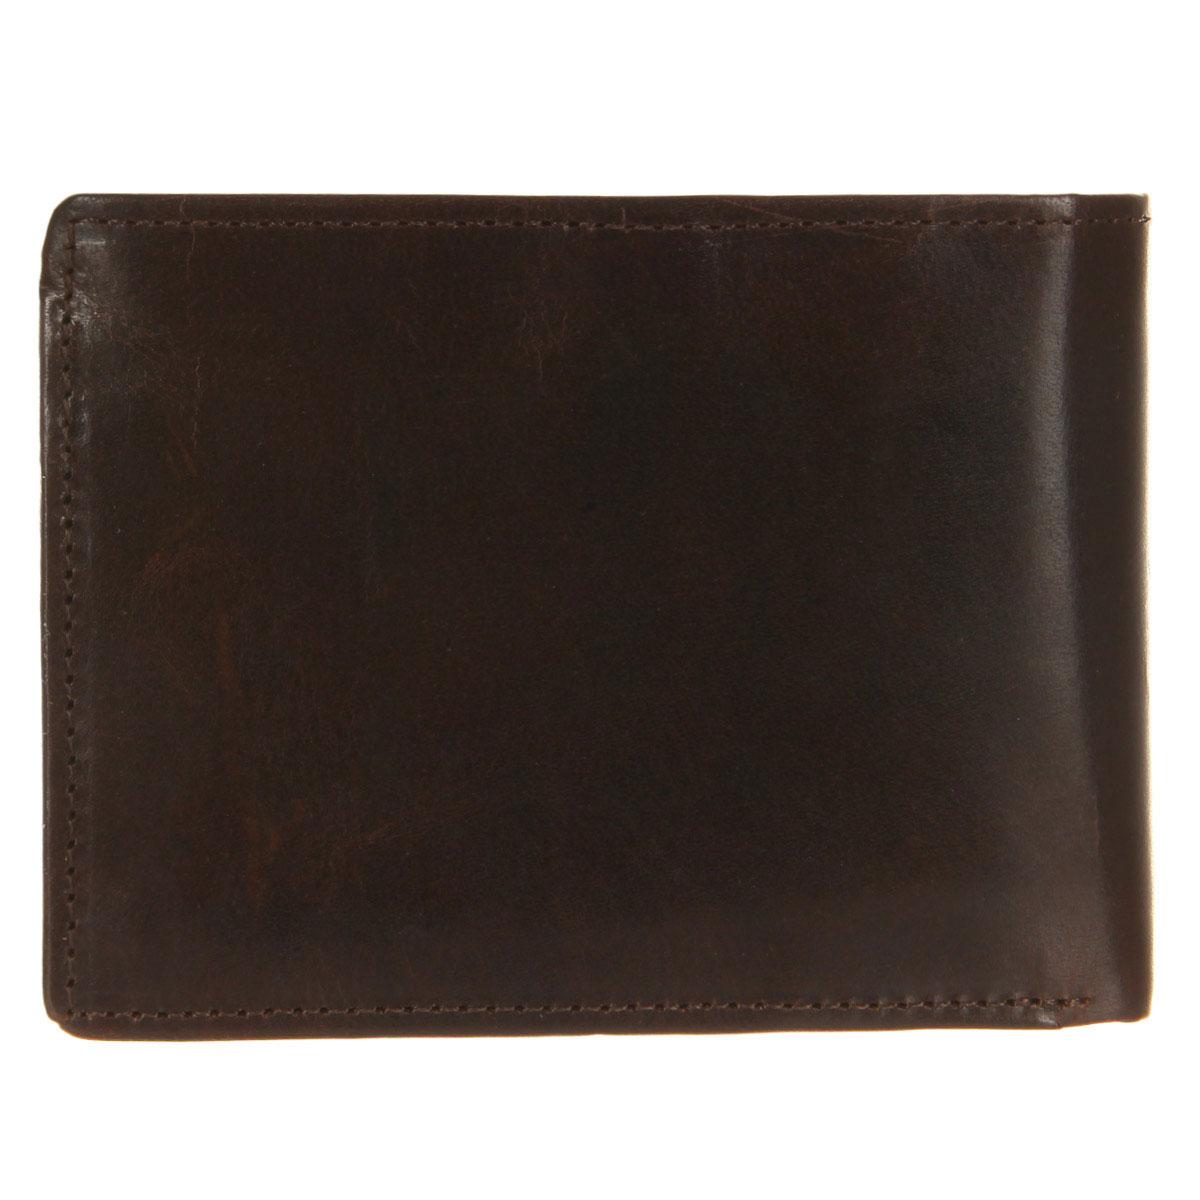 Мужской кошелек Billabong Vacant Leather Chocolate